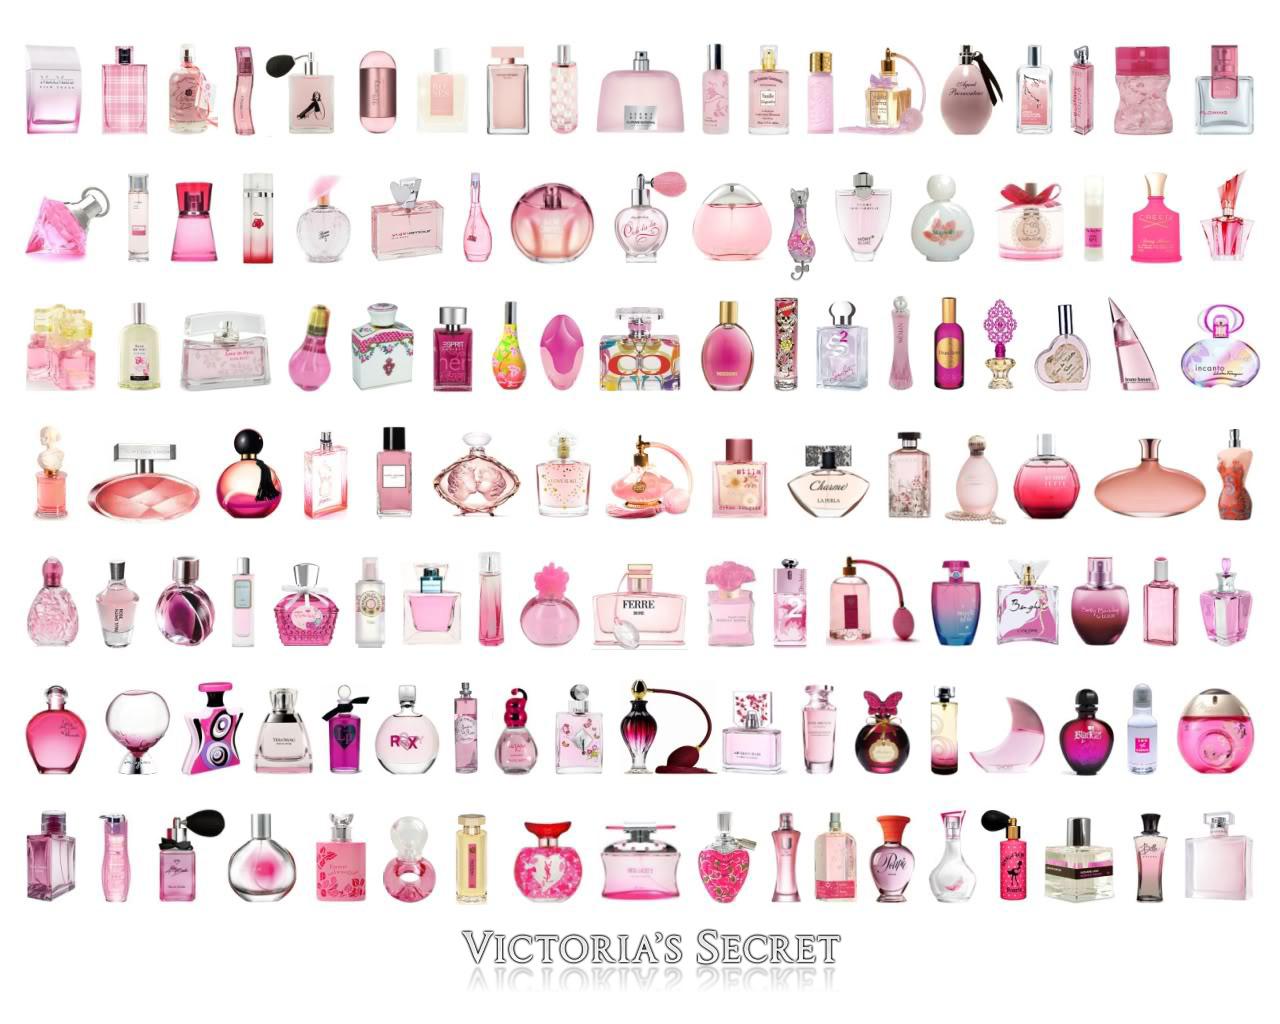 Tumblr iphone wallpaper victoria secret - Victoria S Secret Images Vs Pink Hd Wallpaper And Background Photos